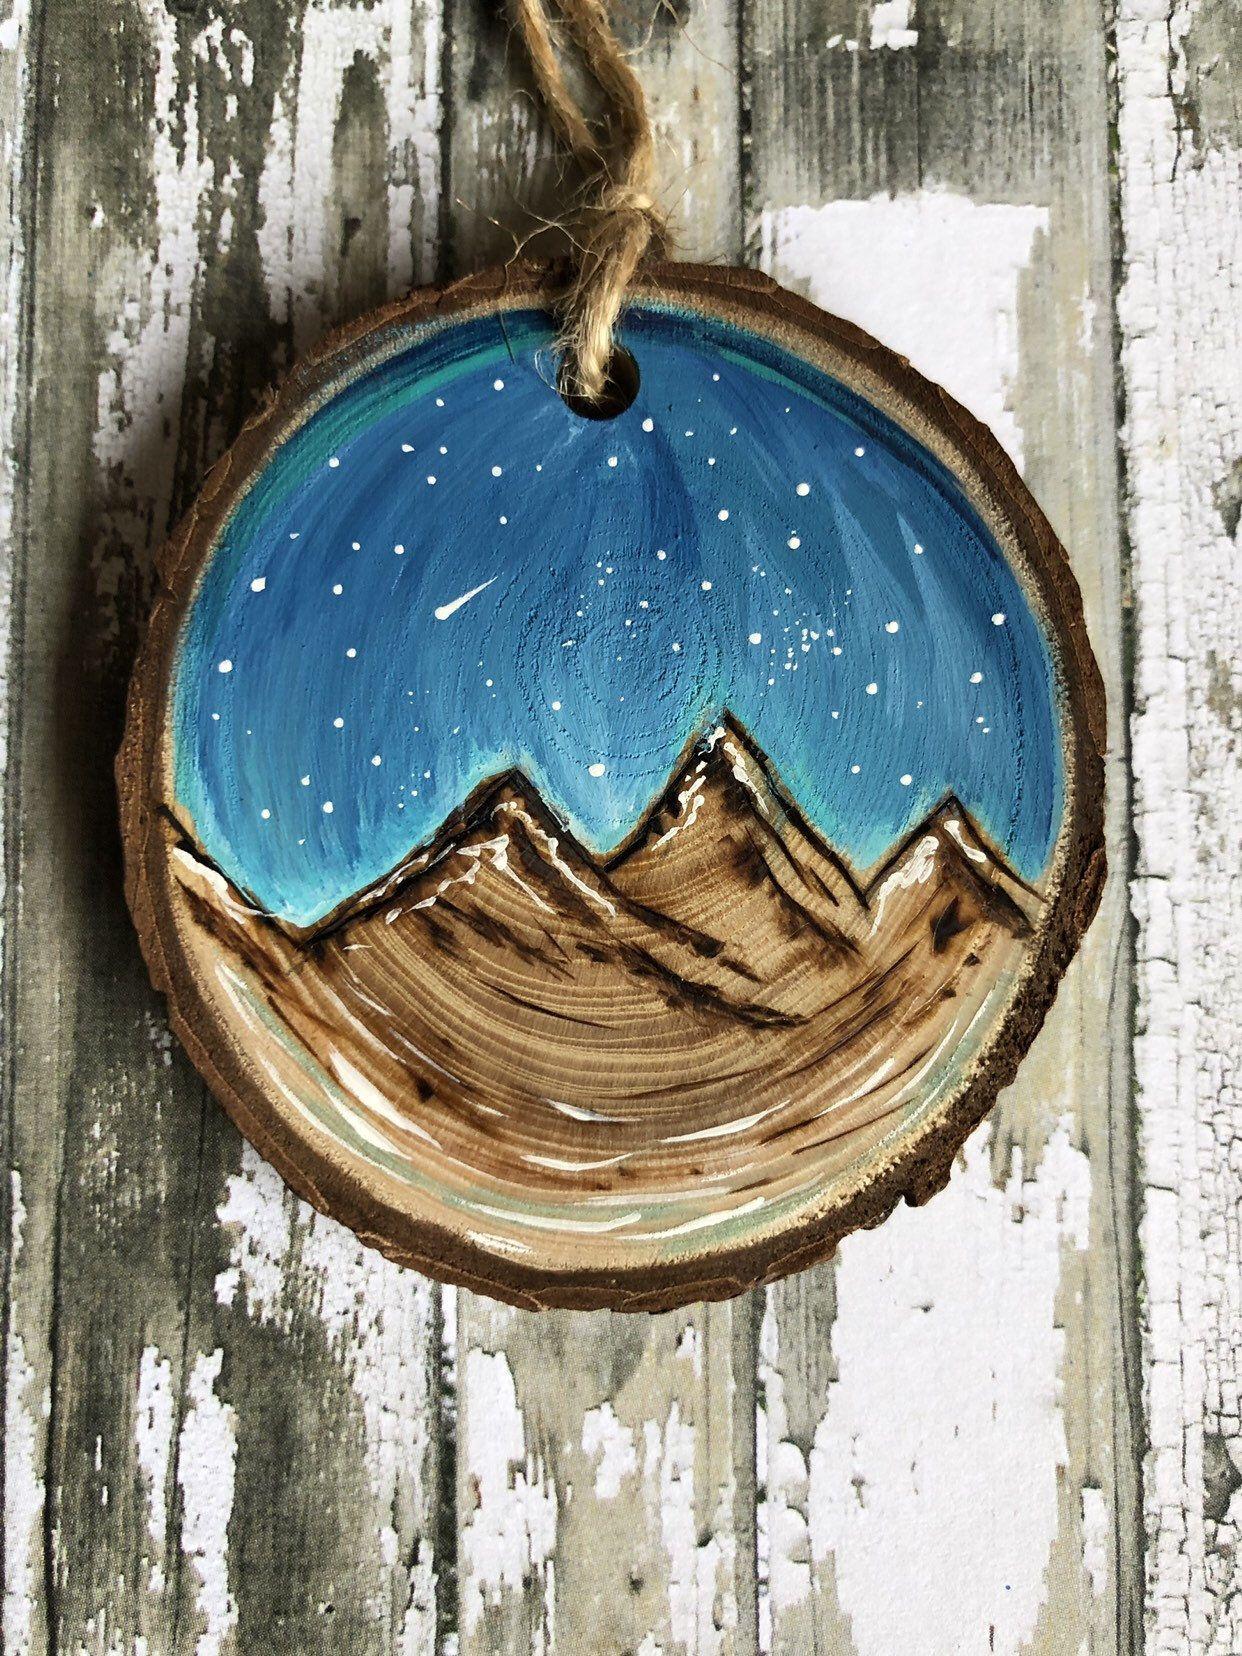 Wood burned, handpainted wood slice ornament, mountains